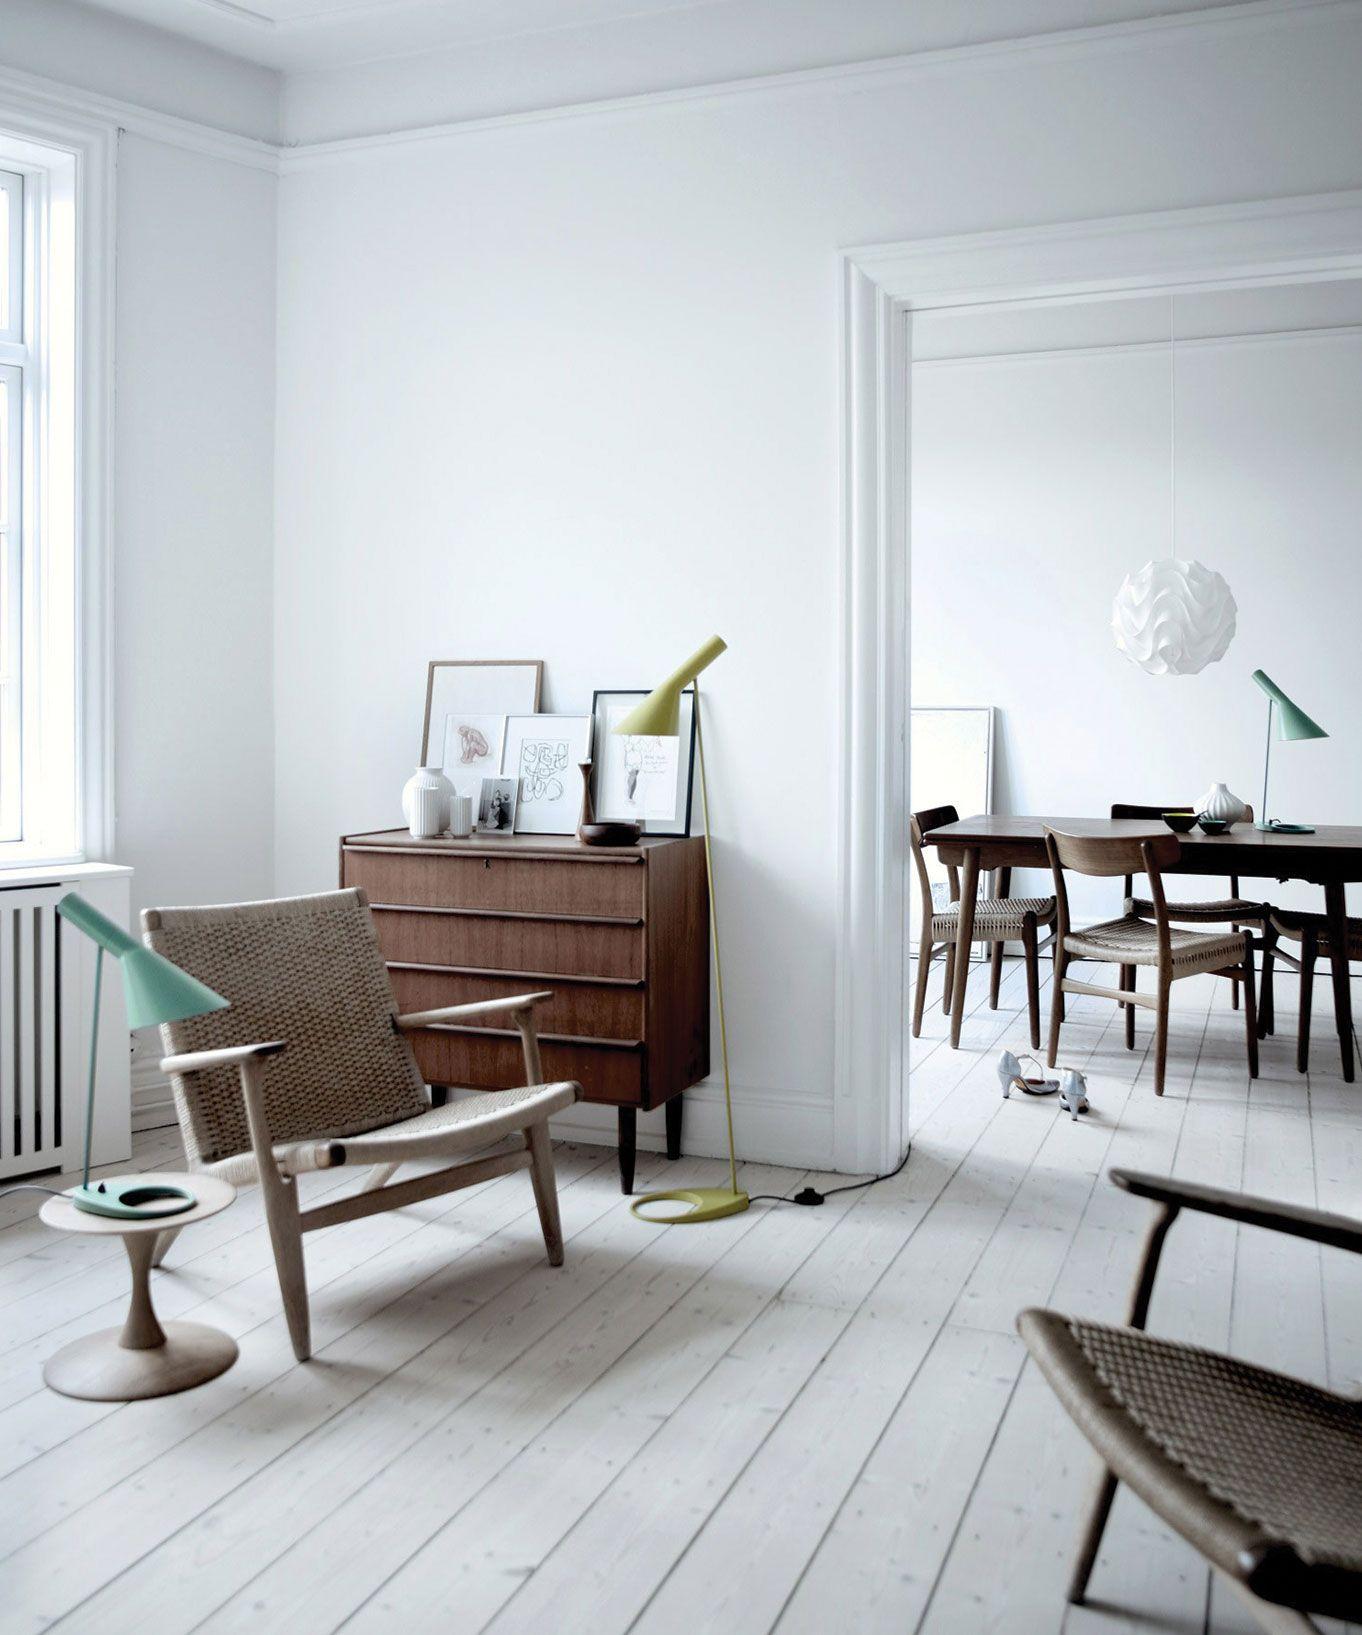 midcentury modern inspired lamps at house pinterest. Black Bedroom Furniture Sets. Home Design Ideas